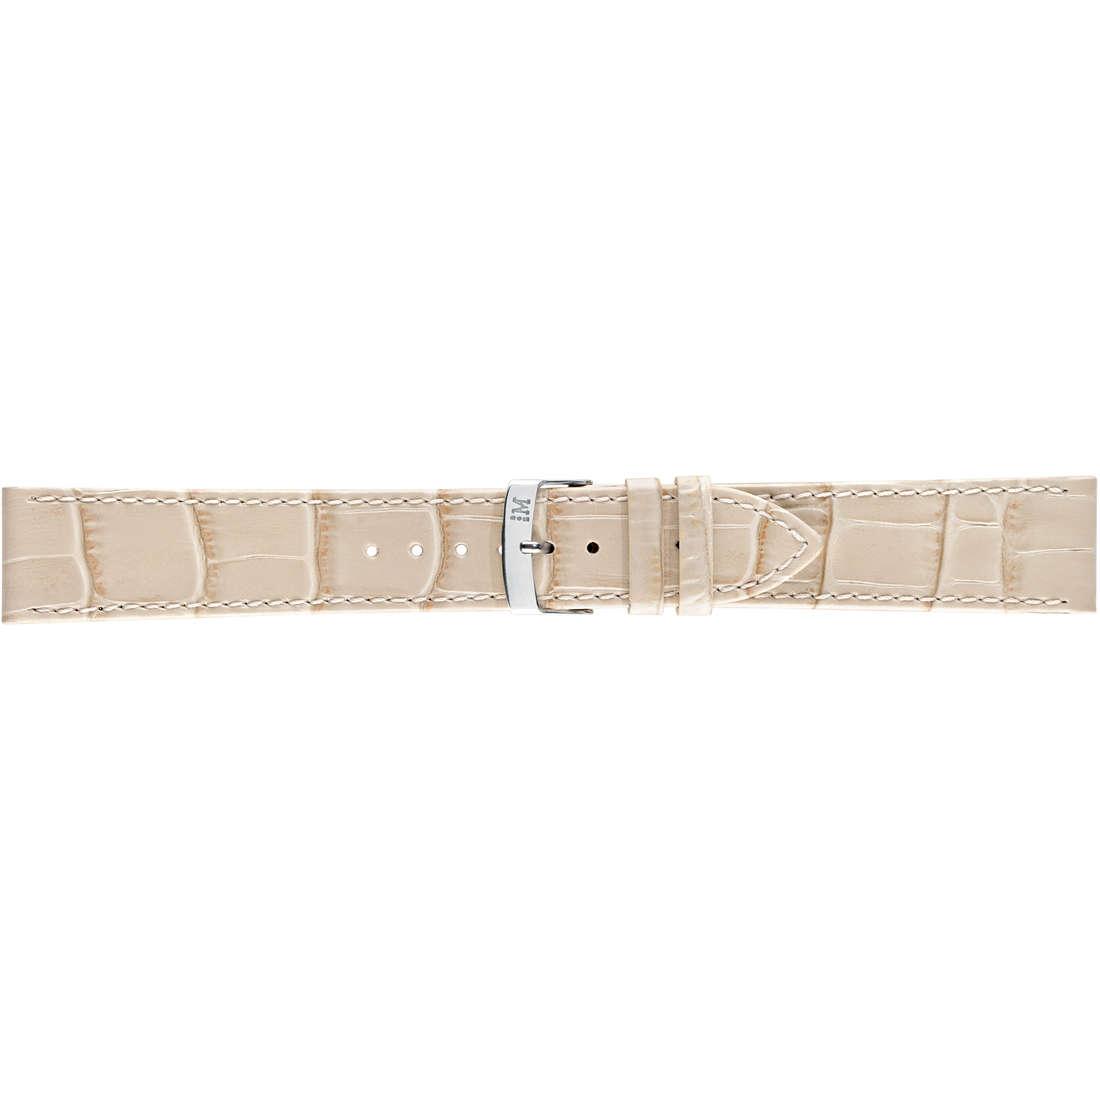 watch watch bands watch straps man Morellato Performance A01X2524656326CR14